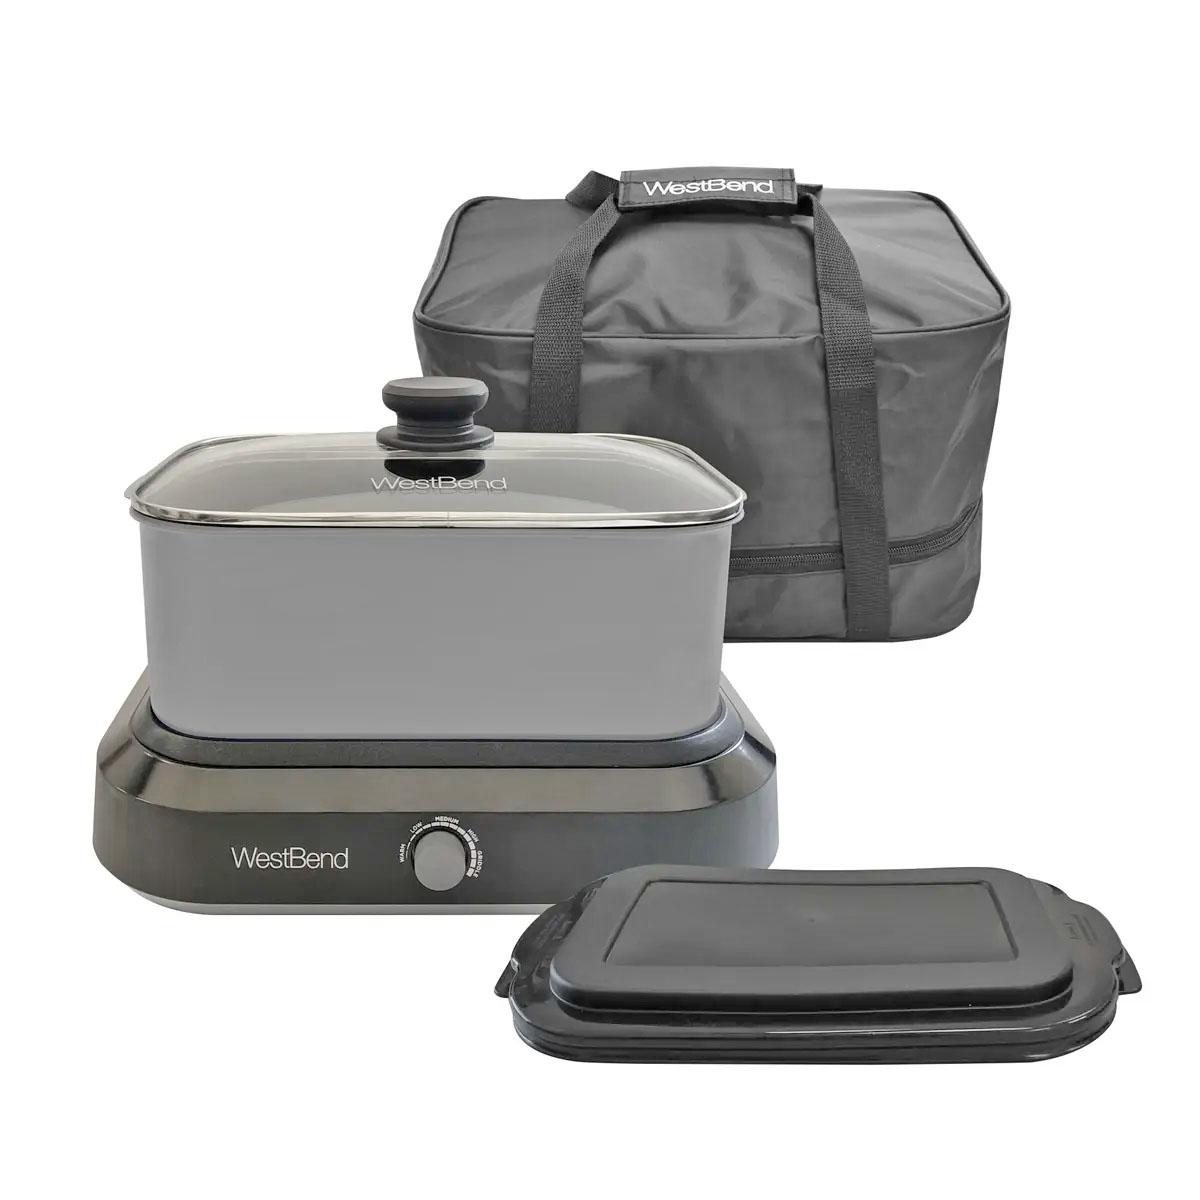 4-in-1 5-Quart Versatility Oblong Cooker - Silver